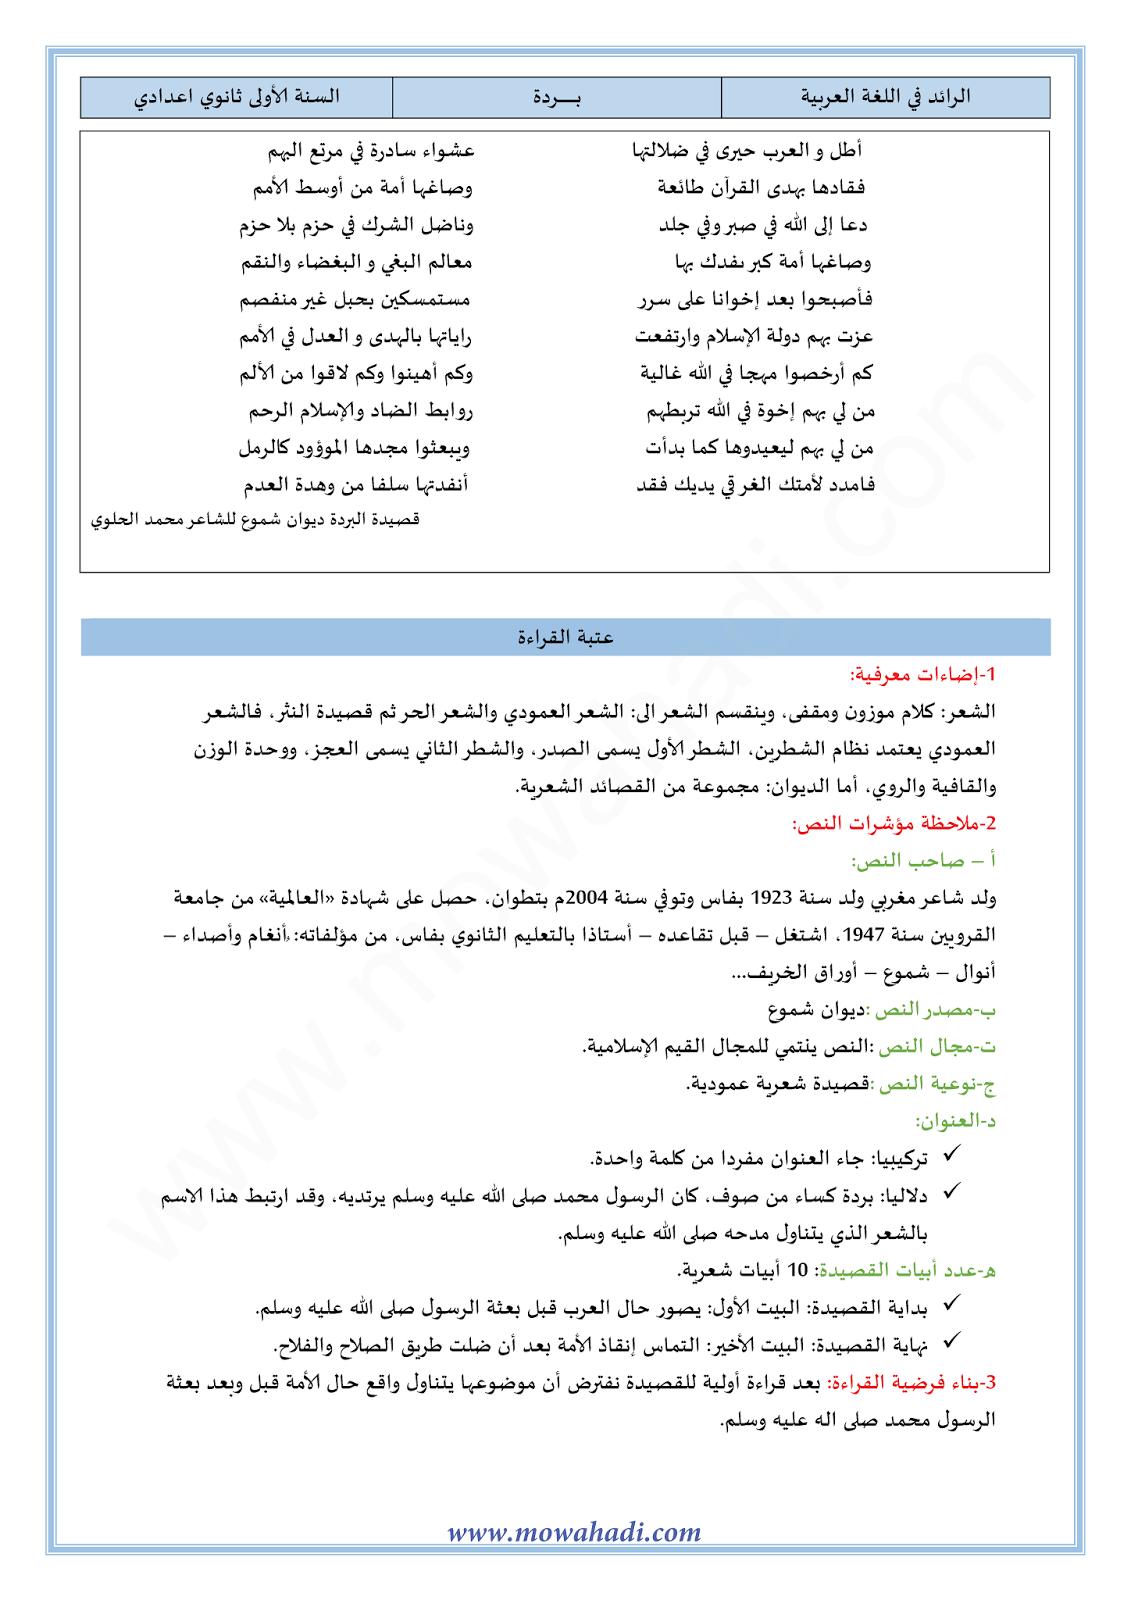 بــــــــــــــــردة